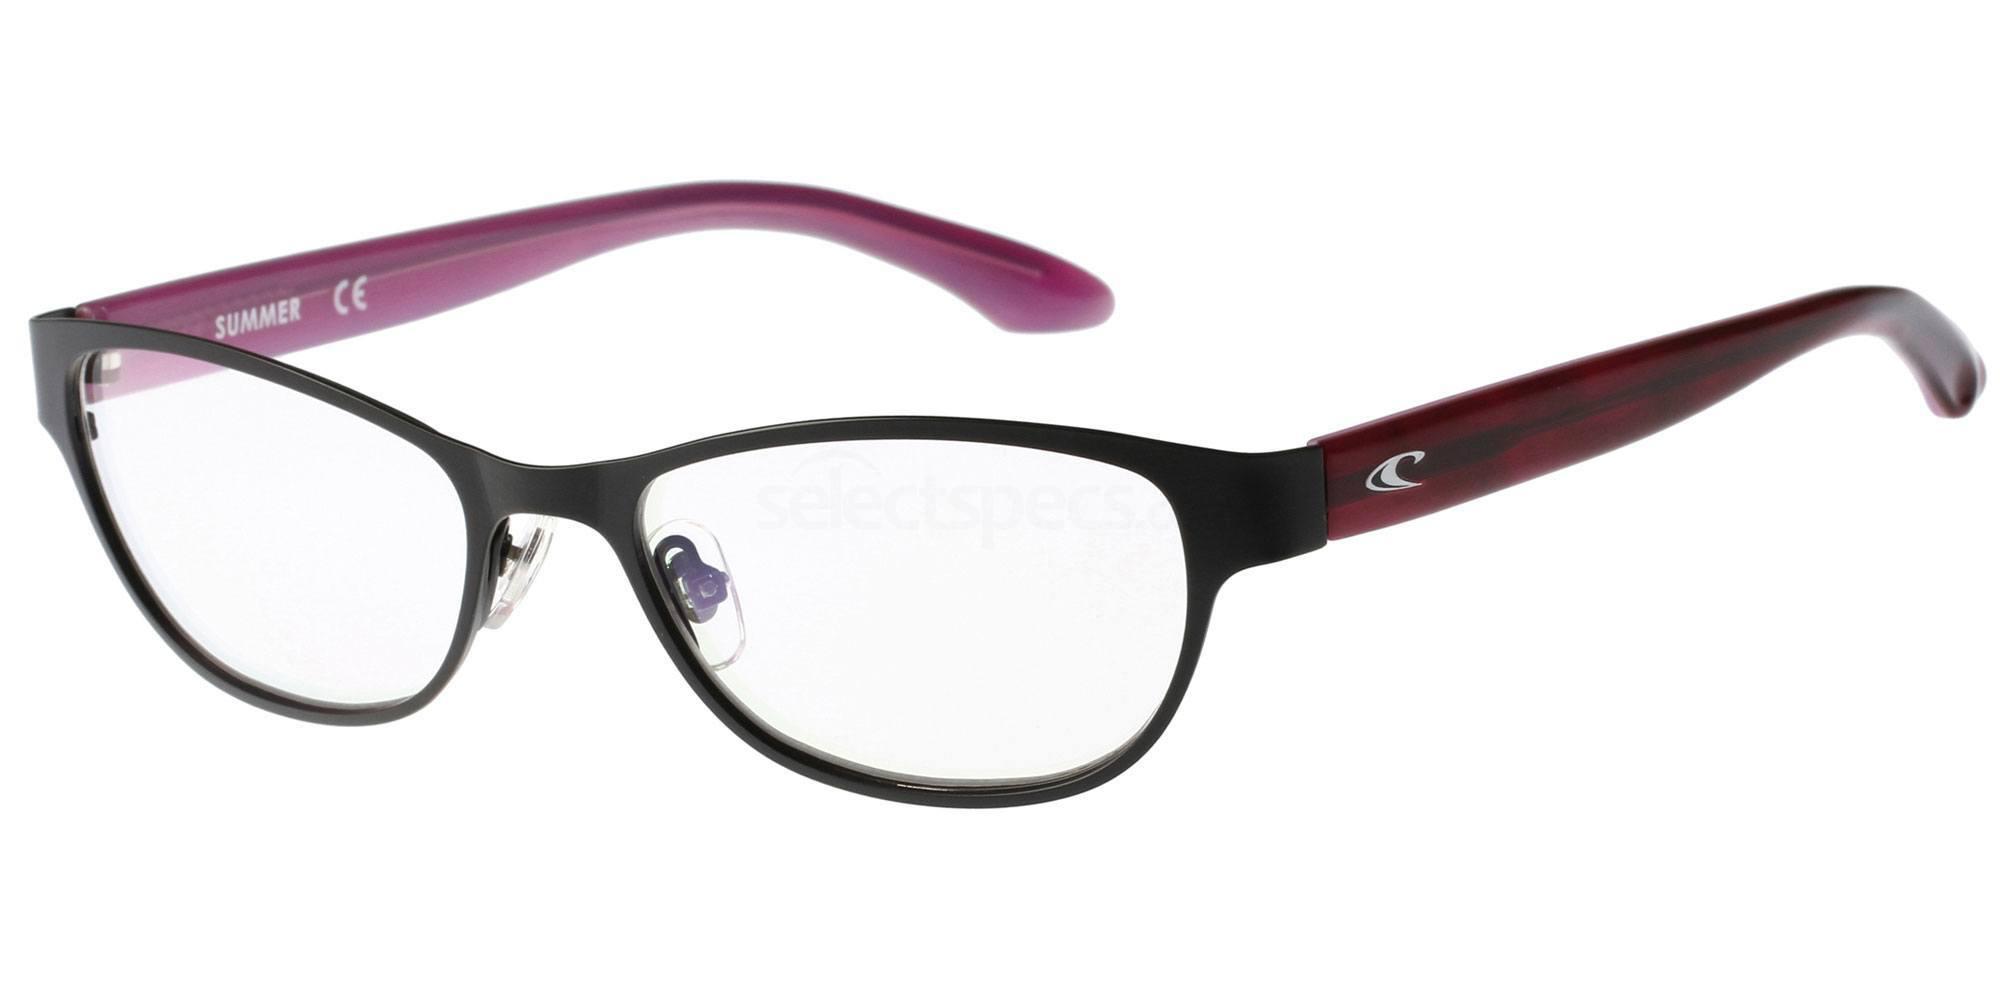 004 ONO-SUMMER Glasses, O'Neill